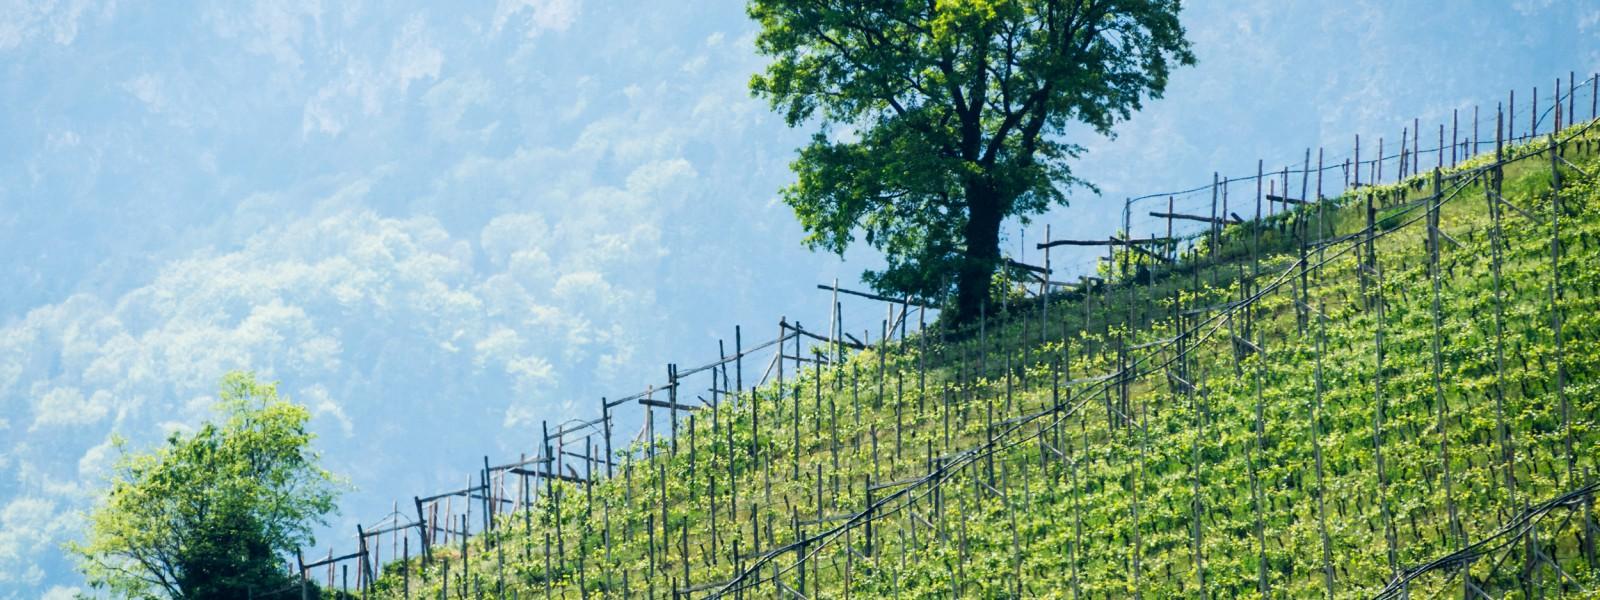 Weinberg an der Südtiroler Weinstraße